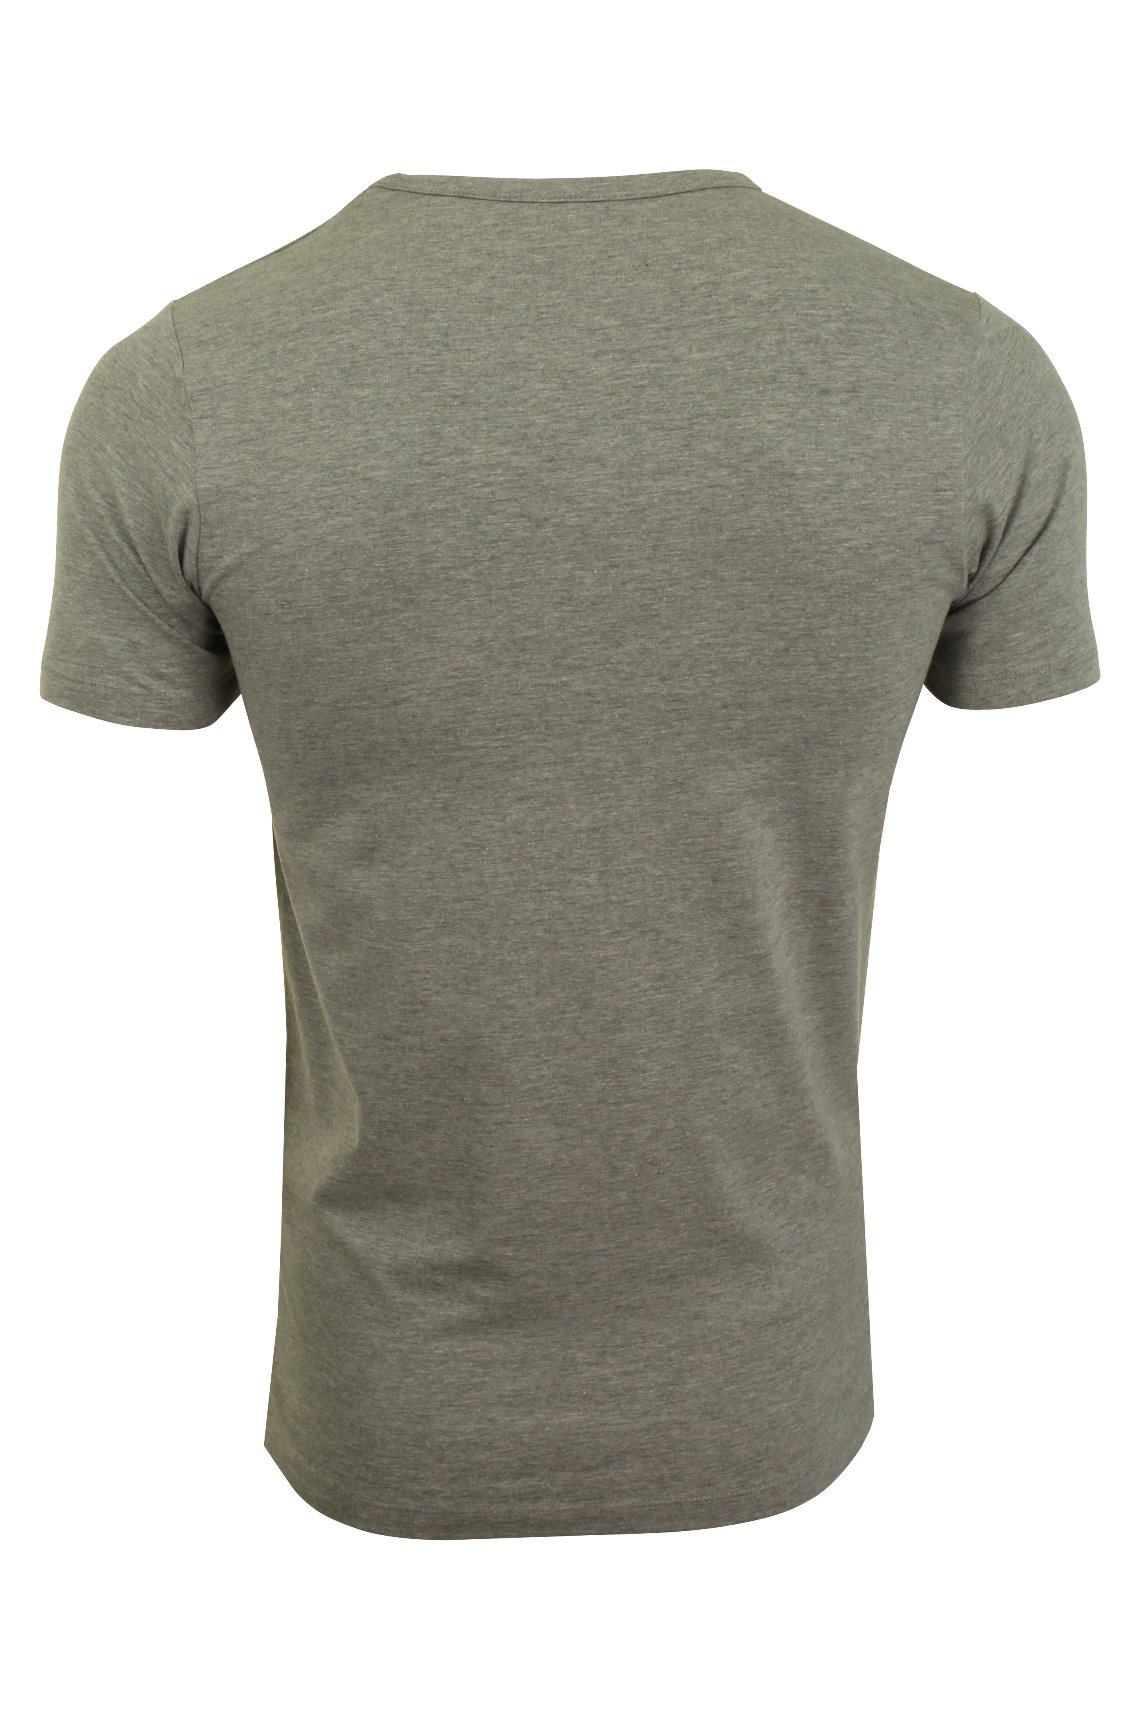 Jack-amp-Jones-De-Hombre-S-S-Cuello-Redondo-Camiseta-Slim-Fit miniatura 6